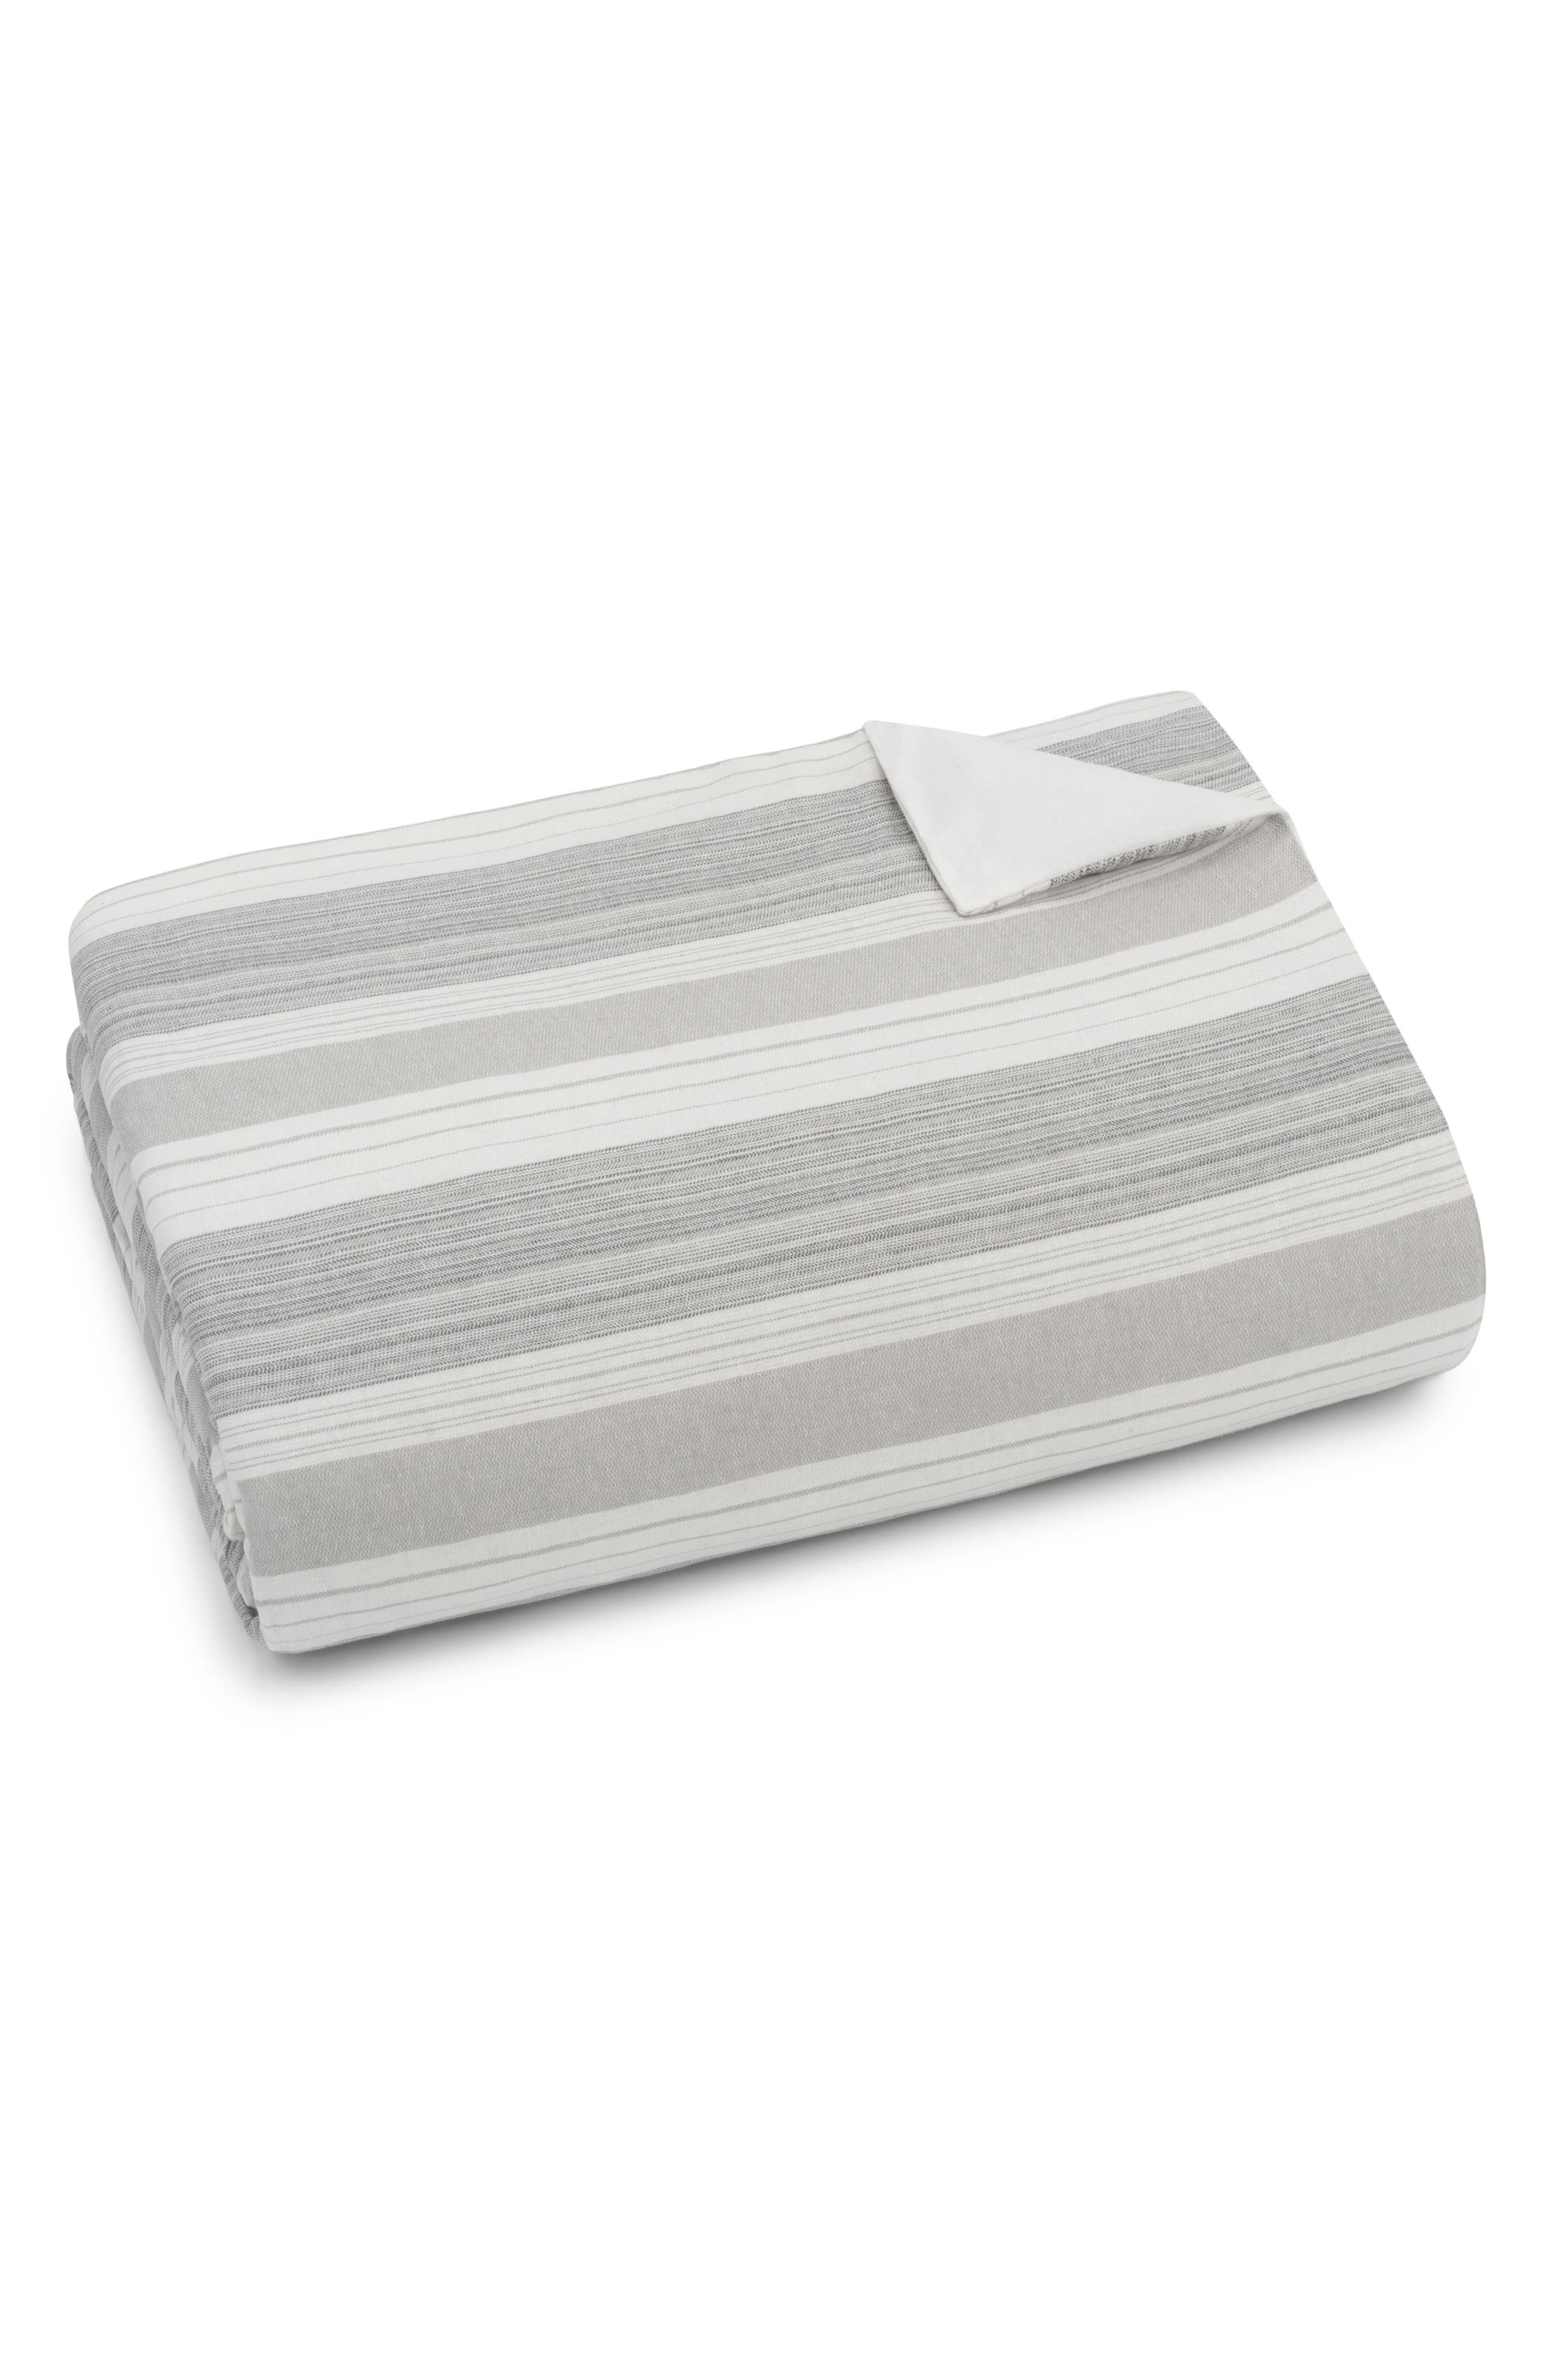 Tatum Stripe Duvet Cover,                         Main,                         color, GREY MULTI